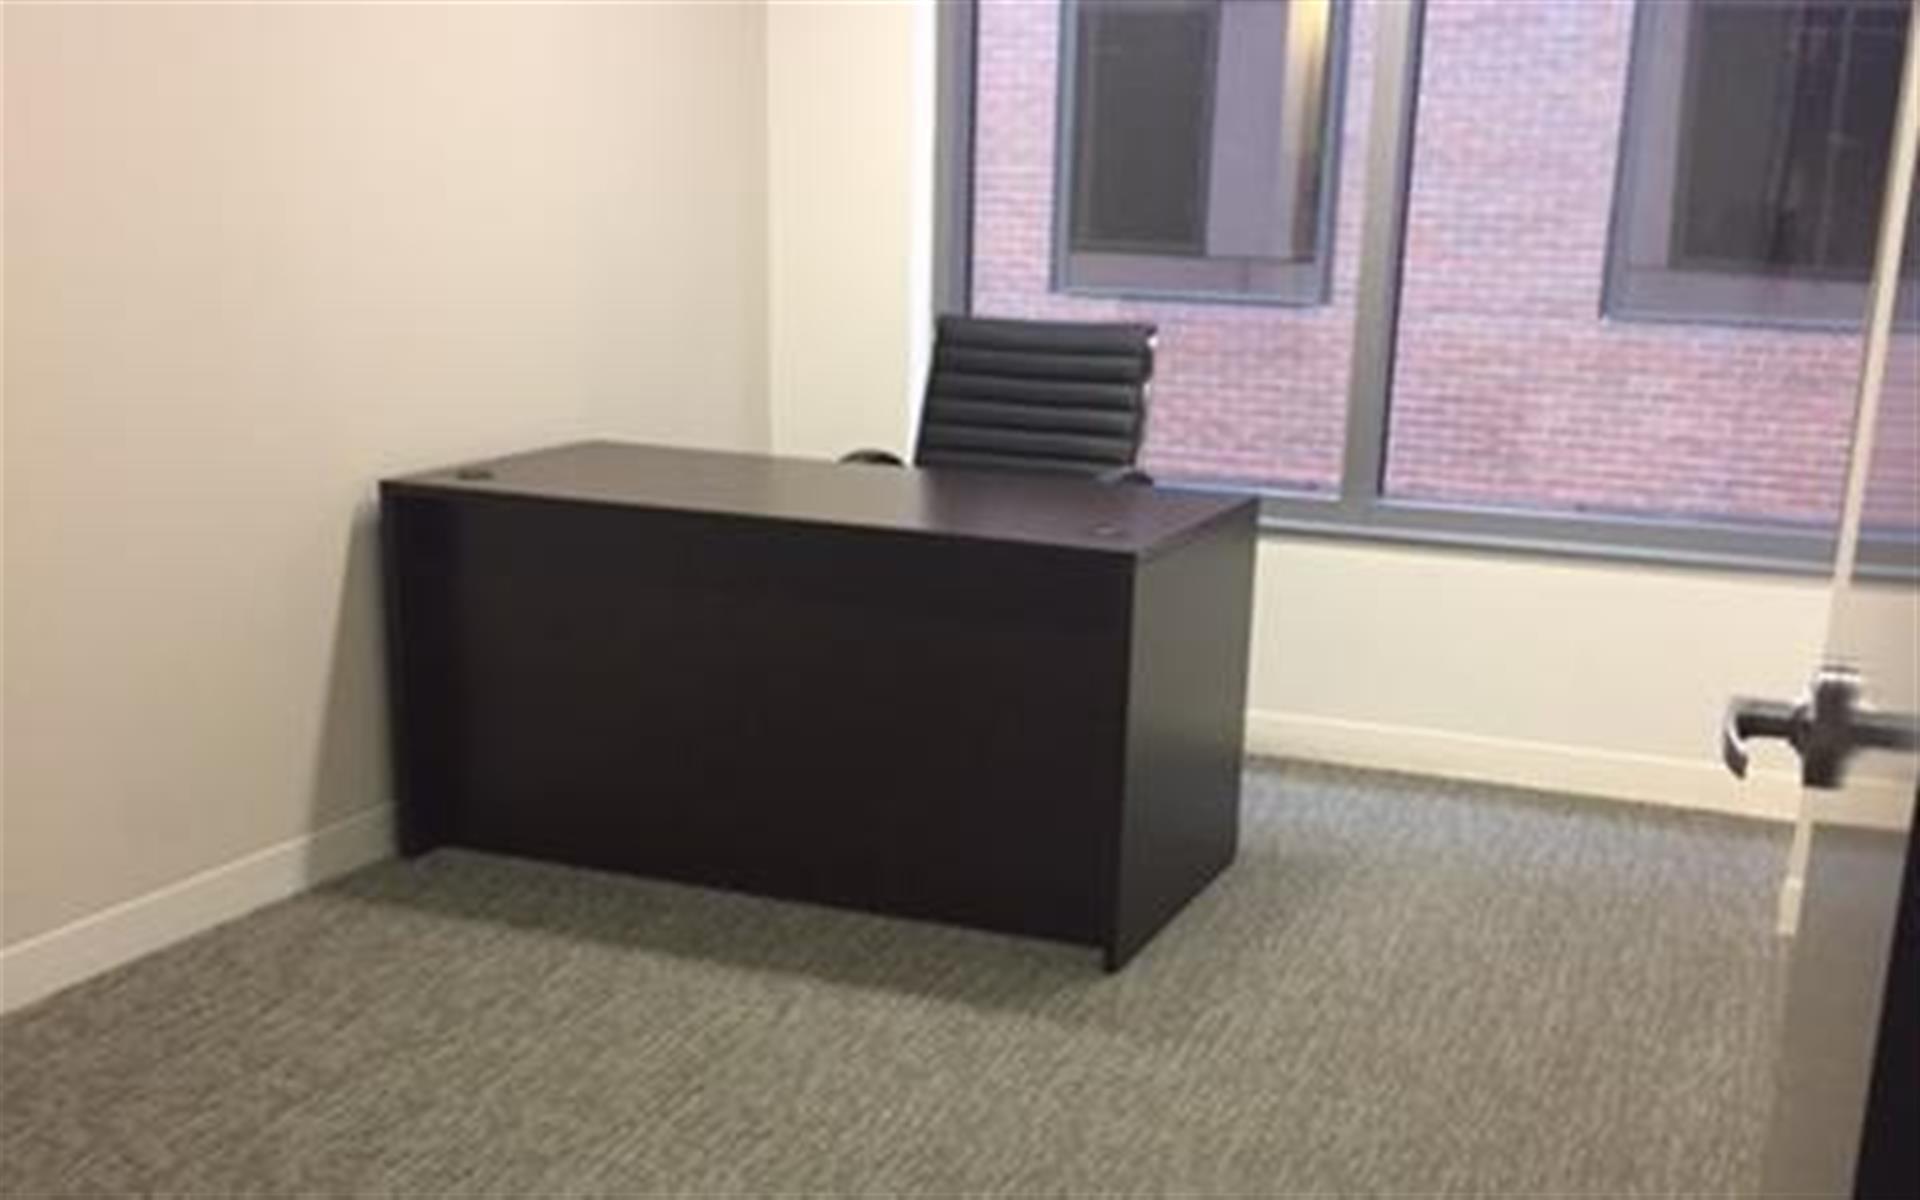 Centurion Center DC - Suite E5 - Windowed Office